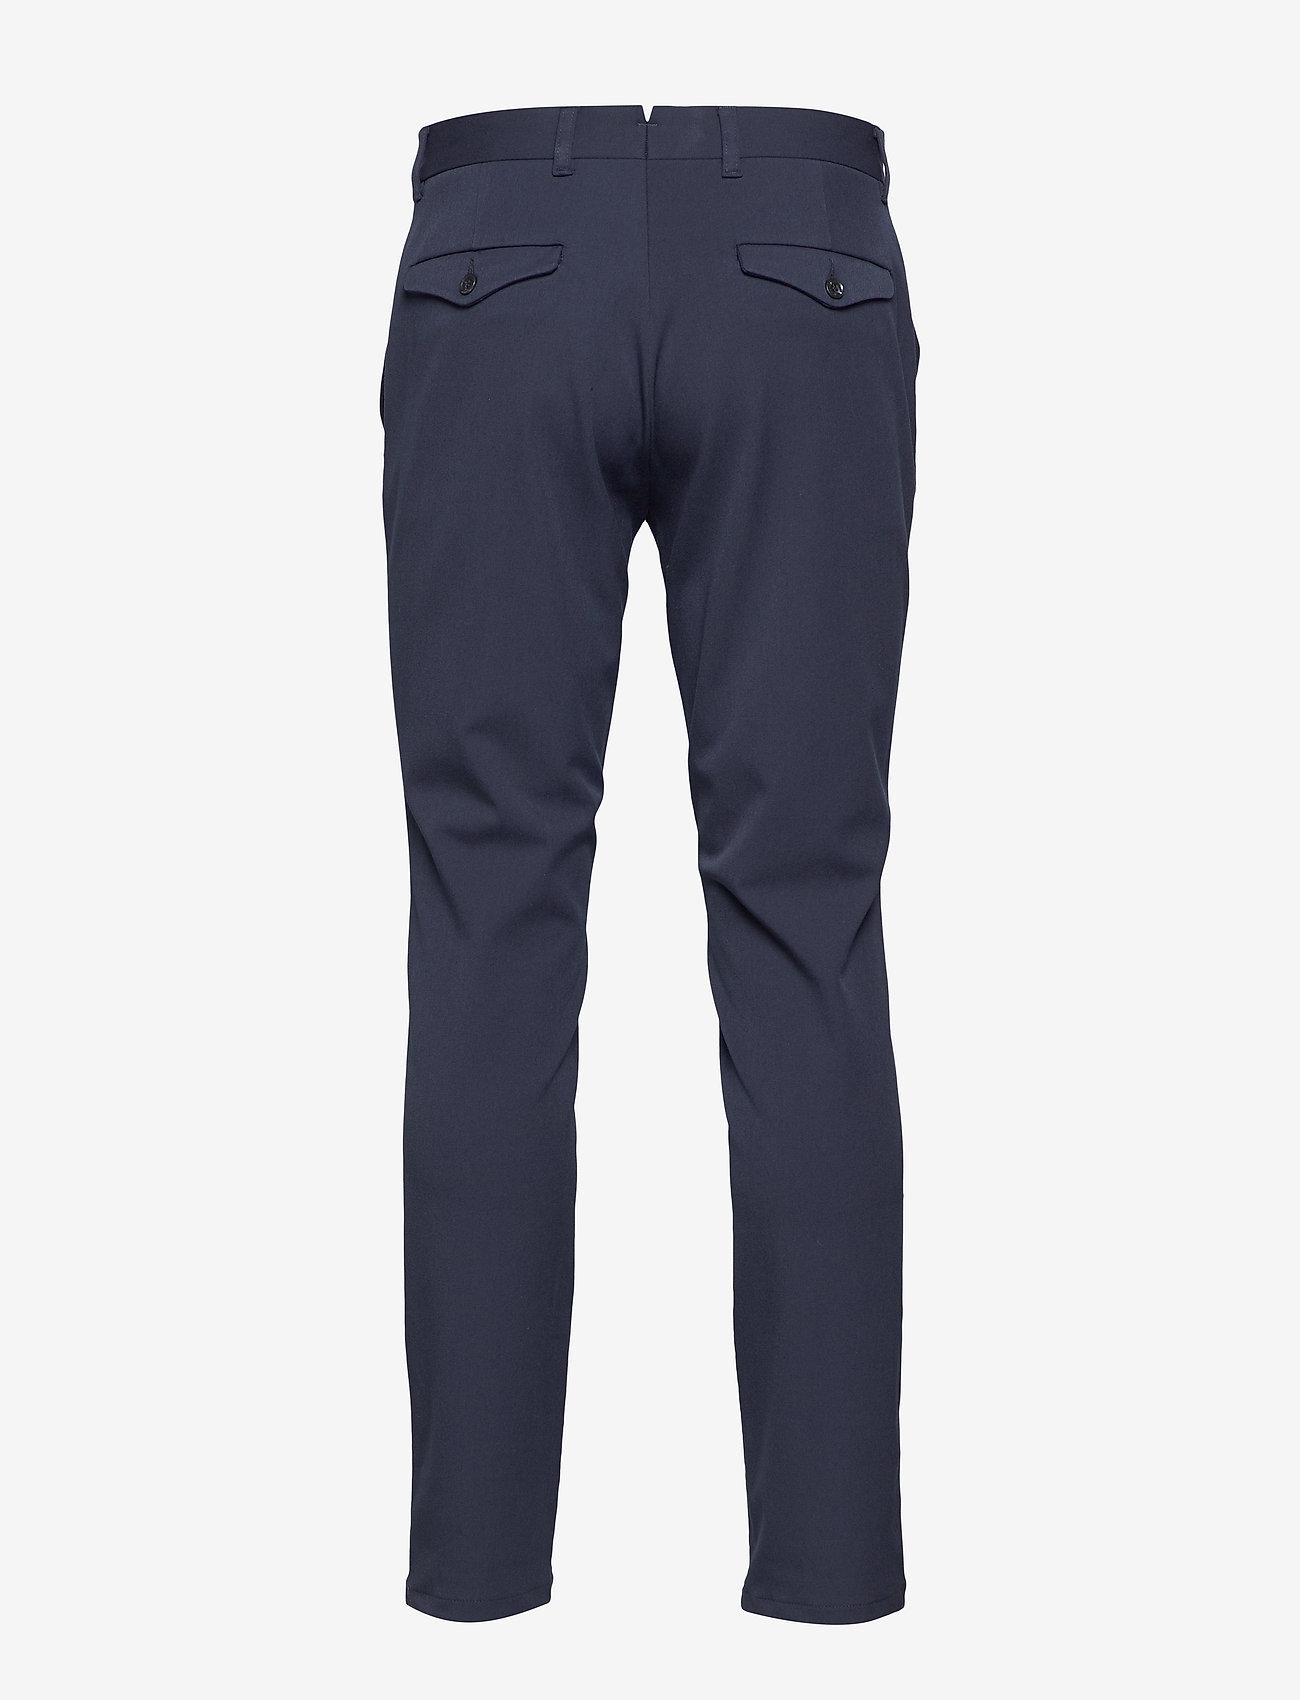 Selected Homme - SLHSLIM-CARLO FLEX PANTS B NOOS - suitbukser - navy blazer - 1